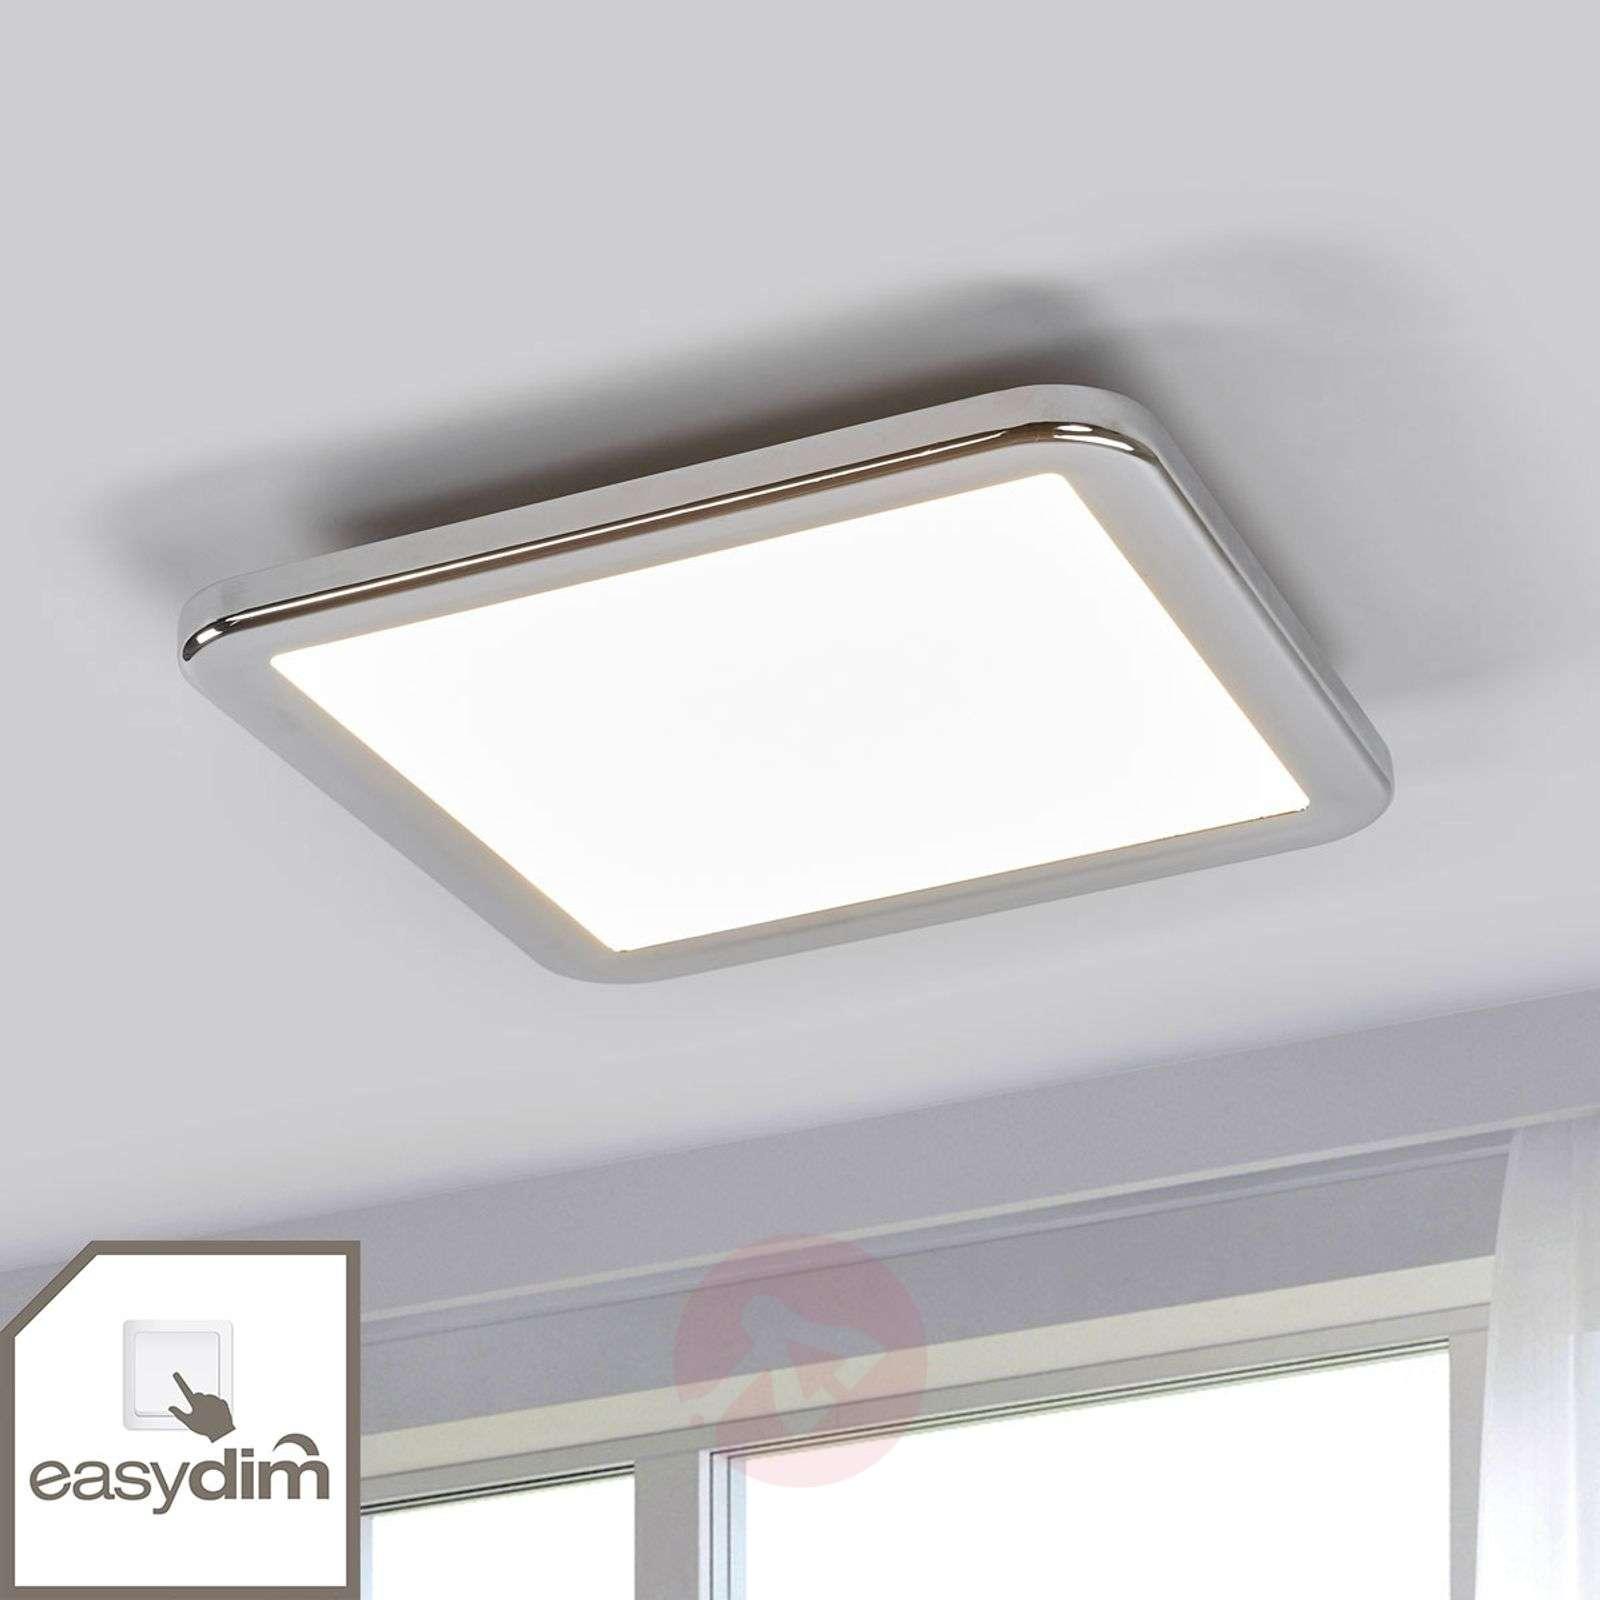 Square Easydim LED ceiling light Filina-1558102-01